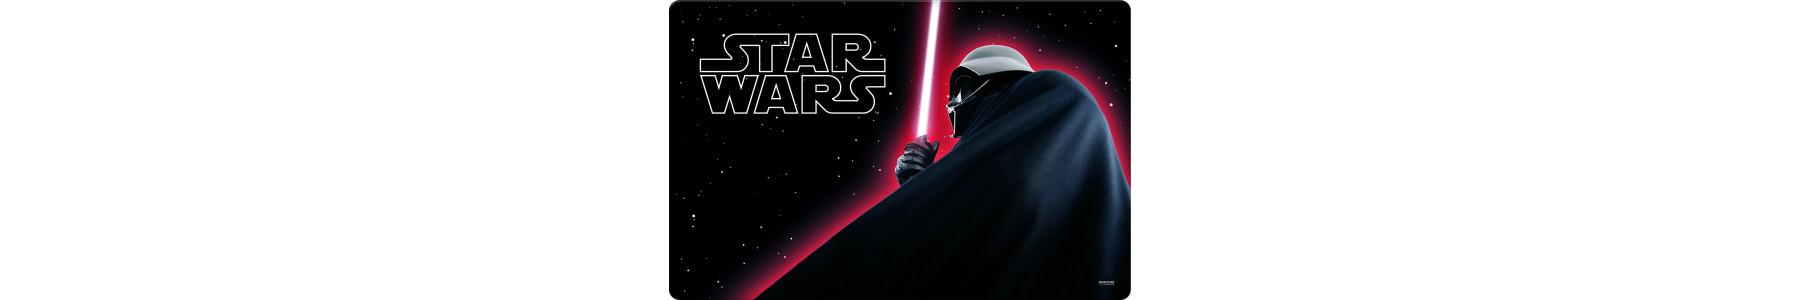 Articole melamina Star Wars